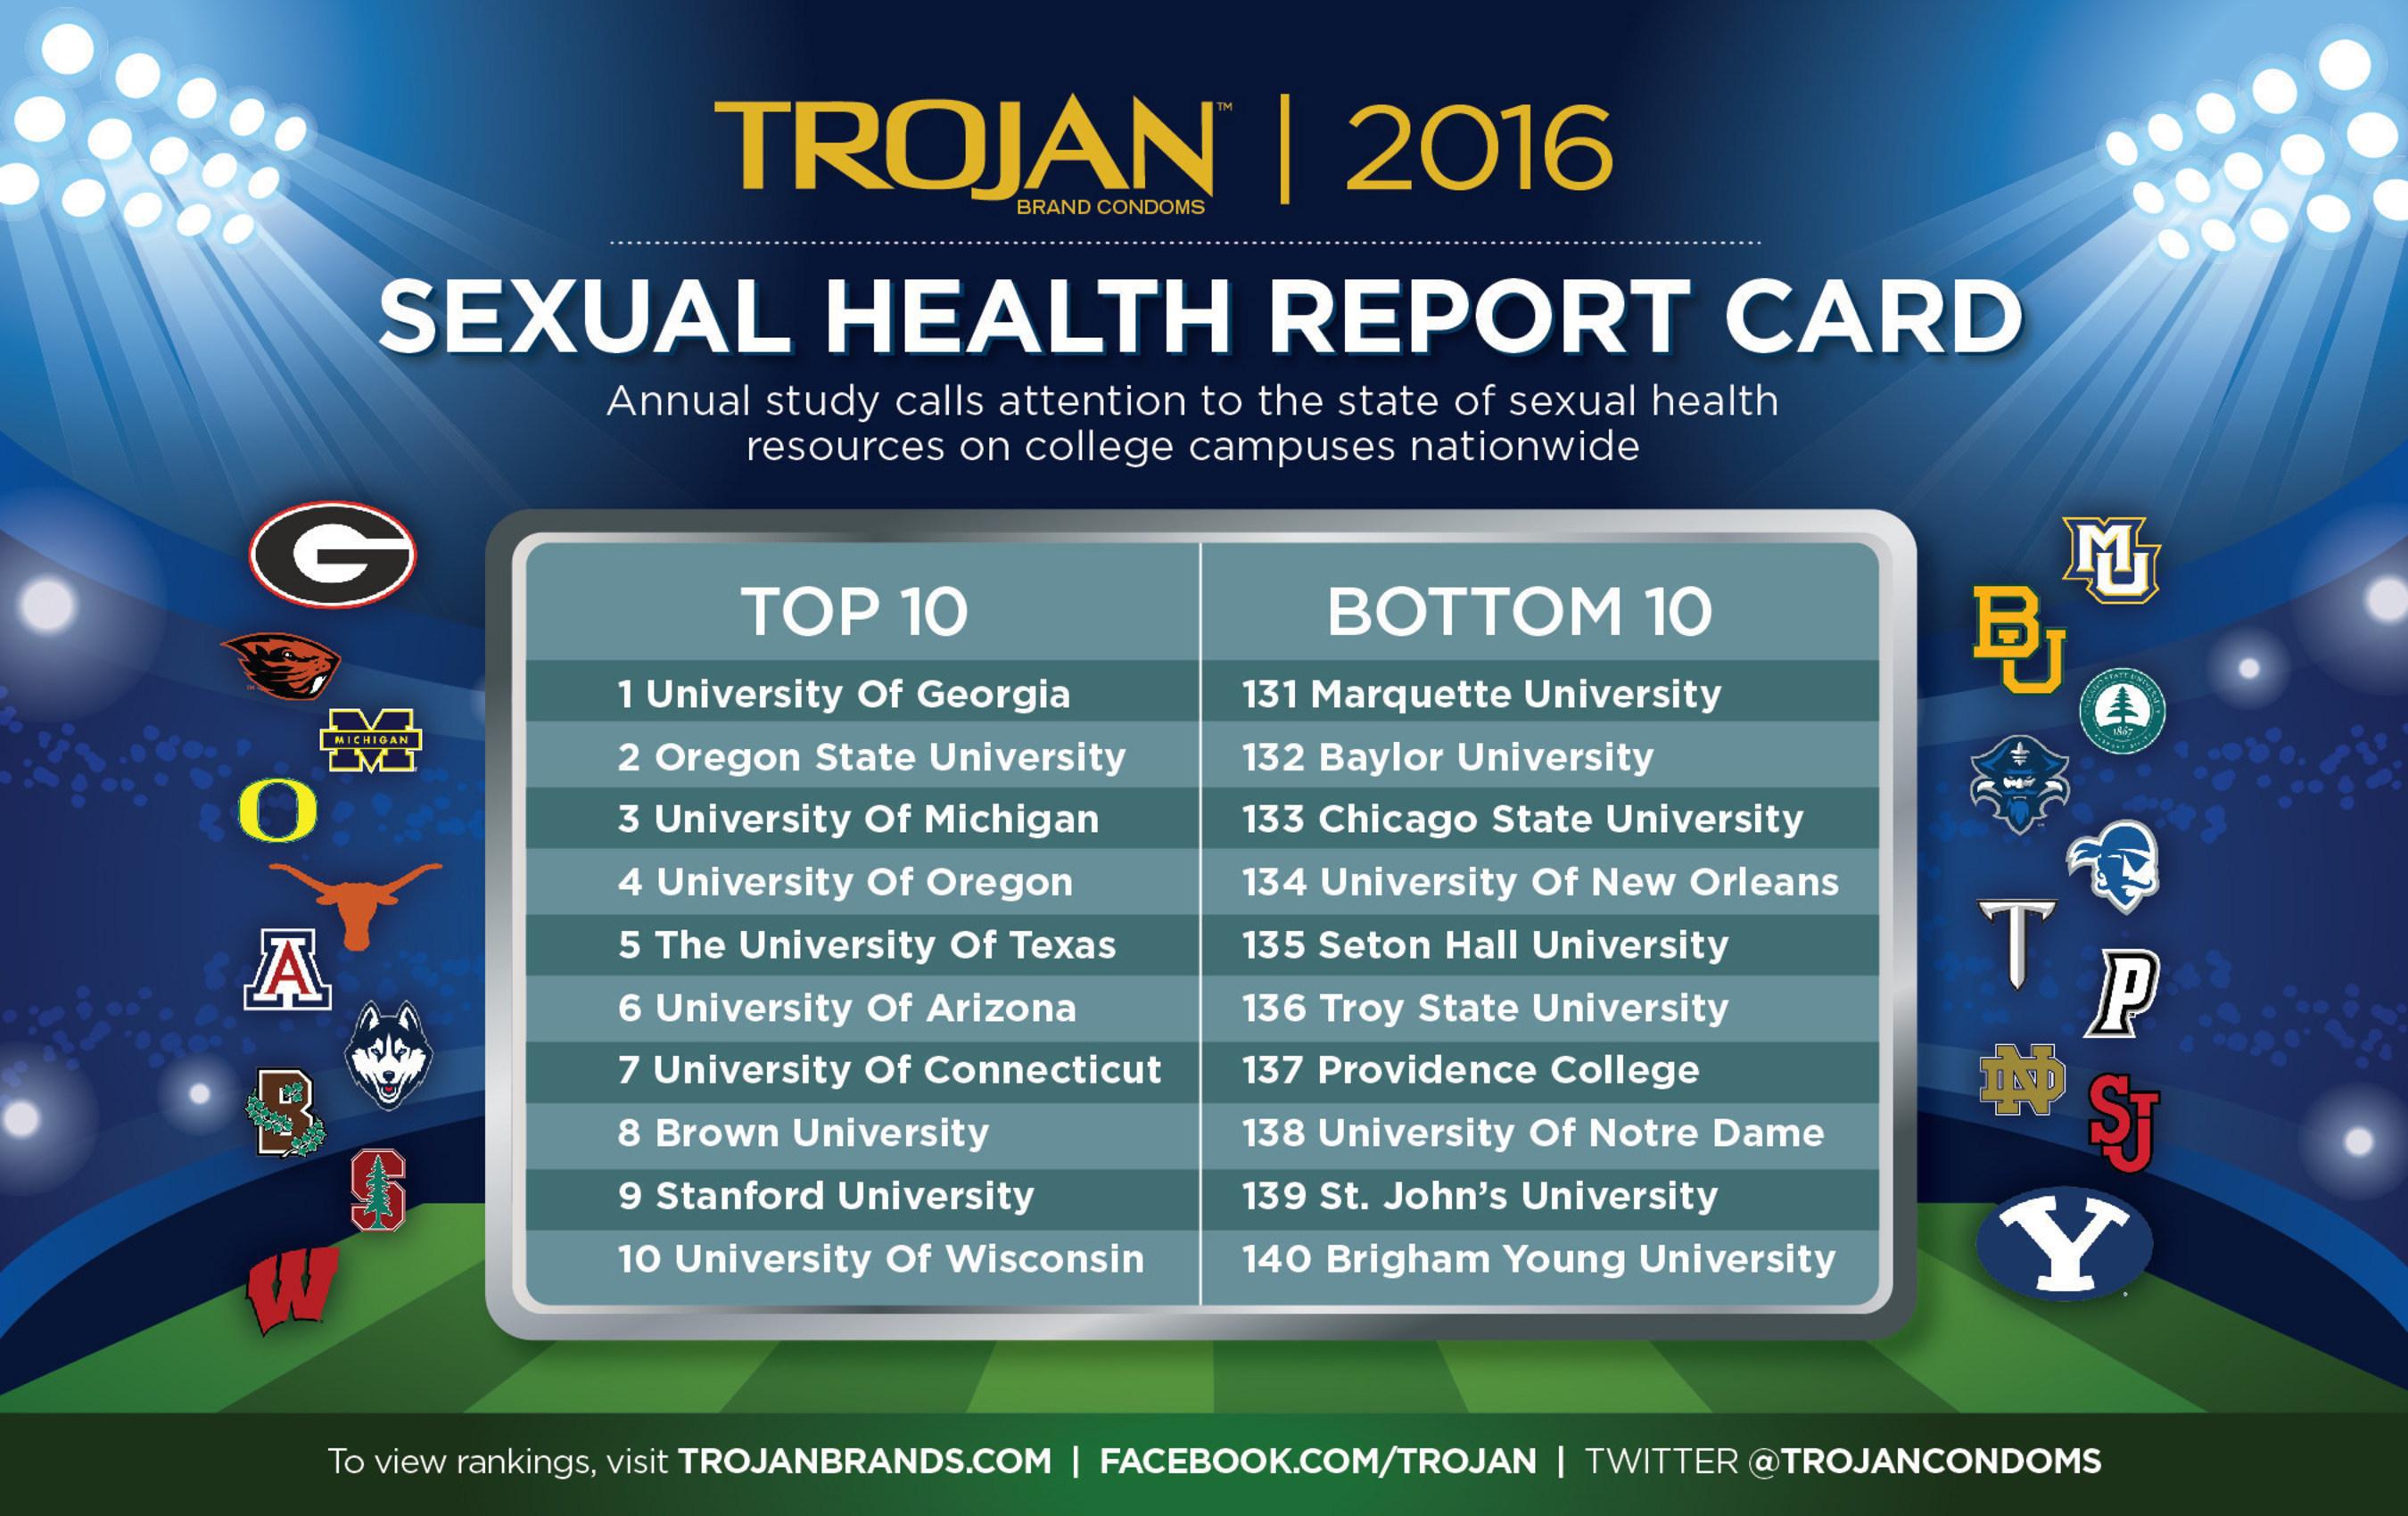 Trojan Sexual Health Report Card Top and Bottom 10 Schools